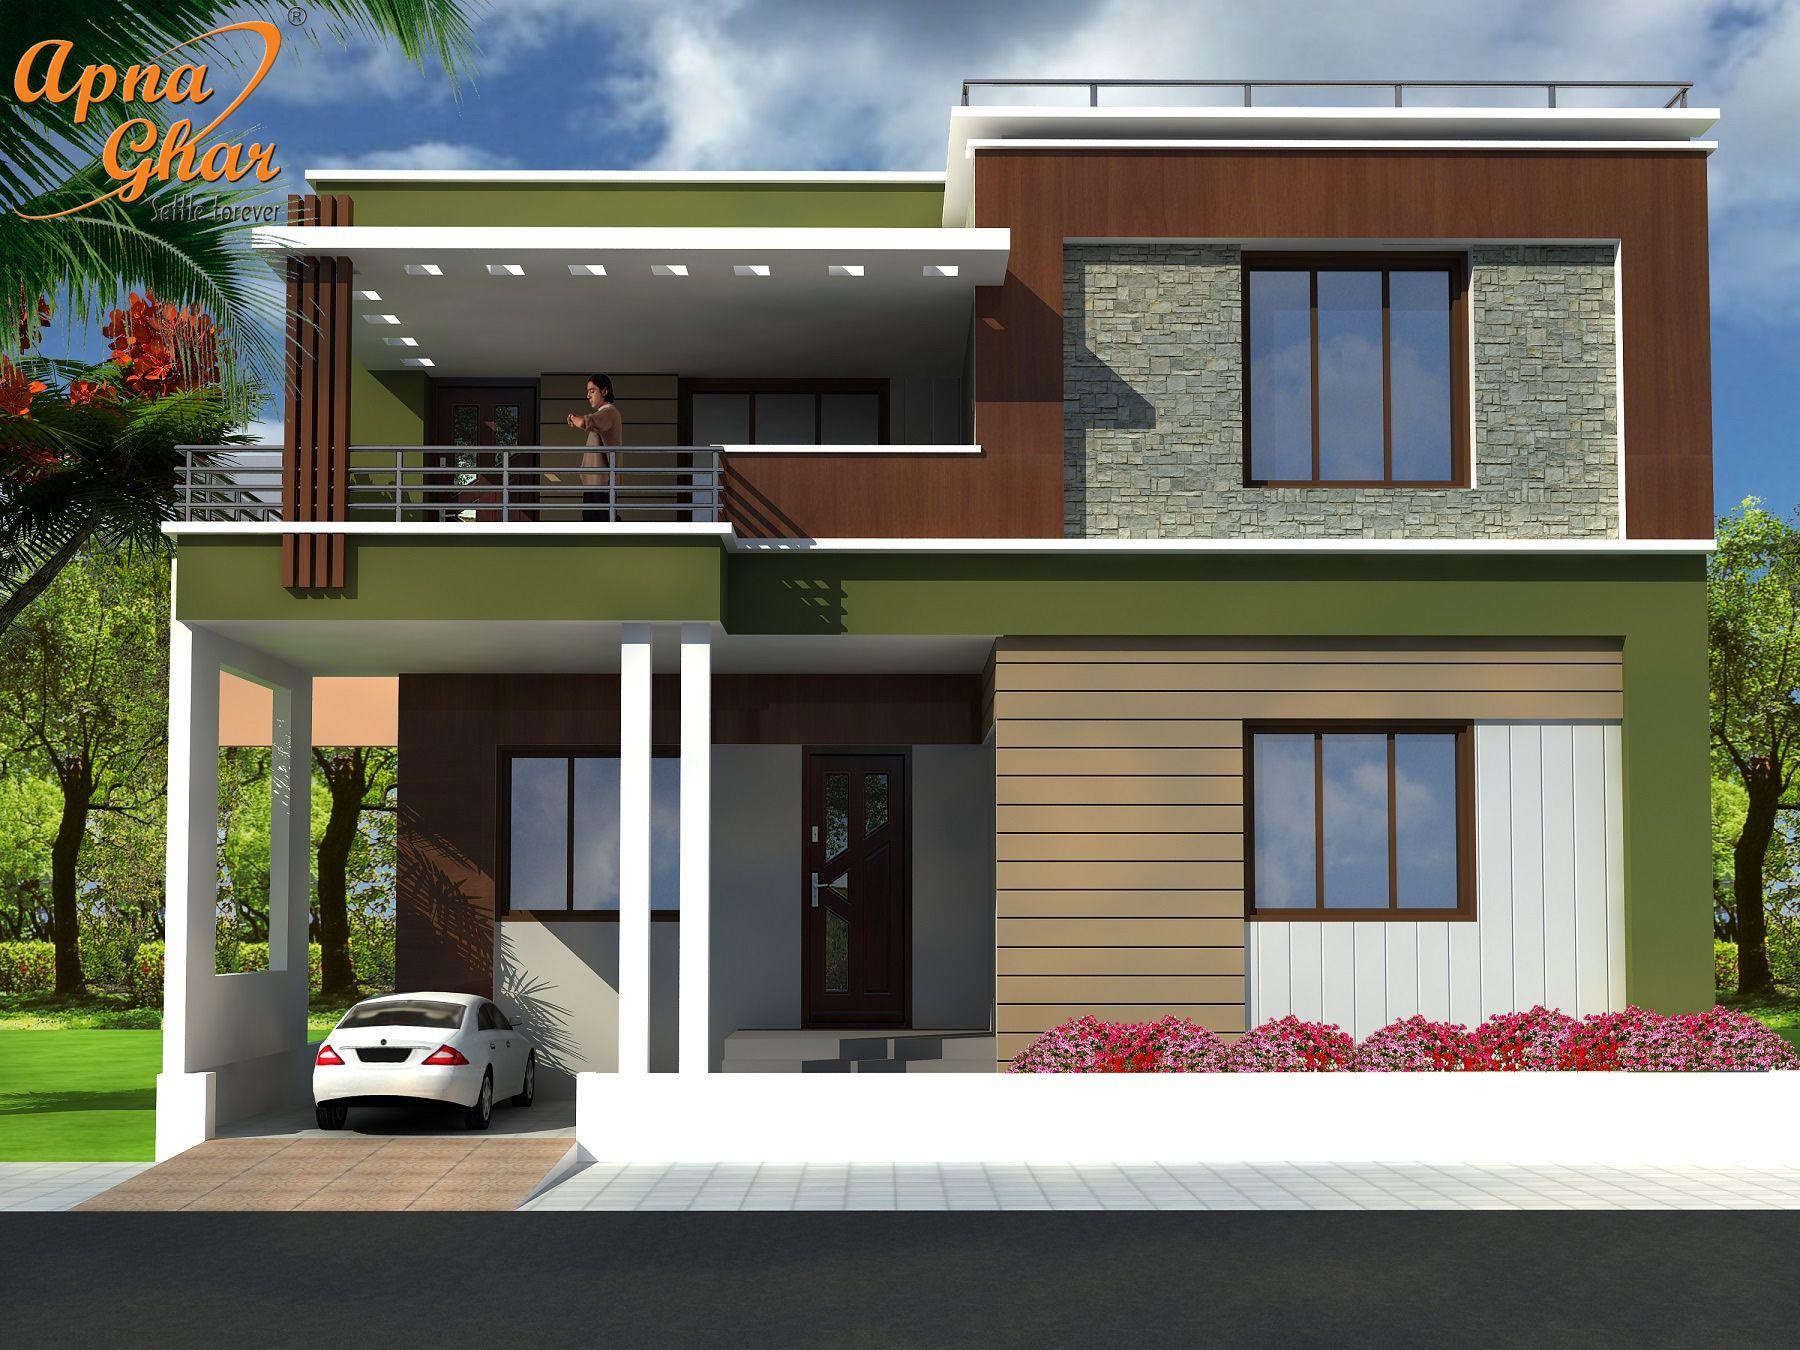 Pin By Apnaghar On Apanghar House Designs Pinterest House Design House And House Front Design